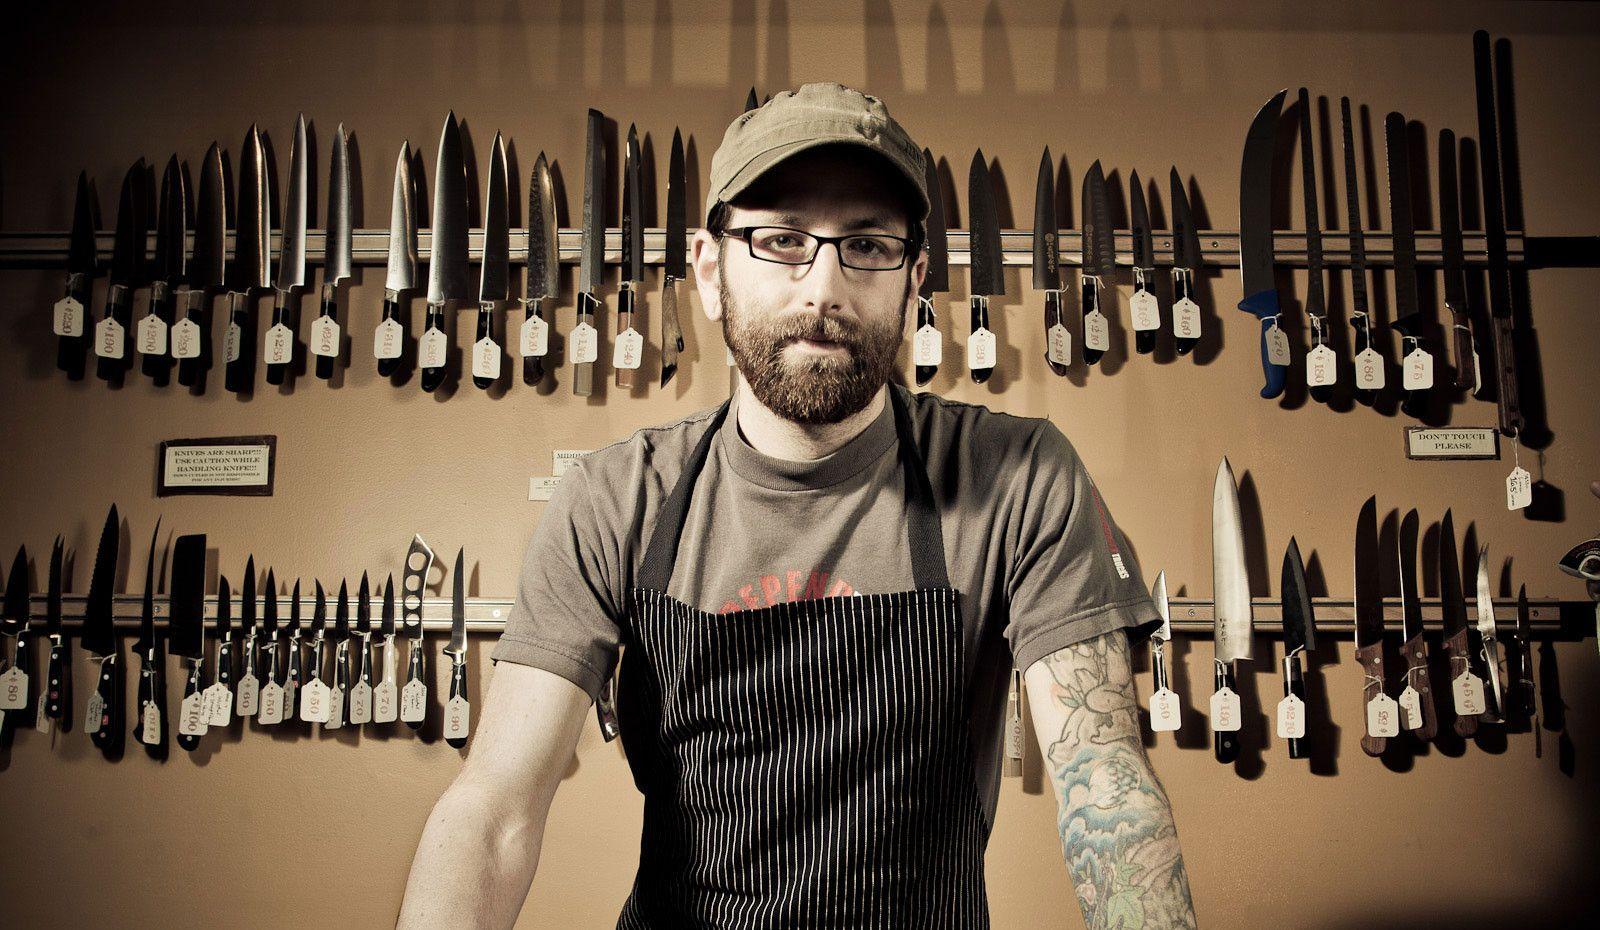 Town Cutler Handmade - amazing knives!!